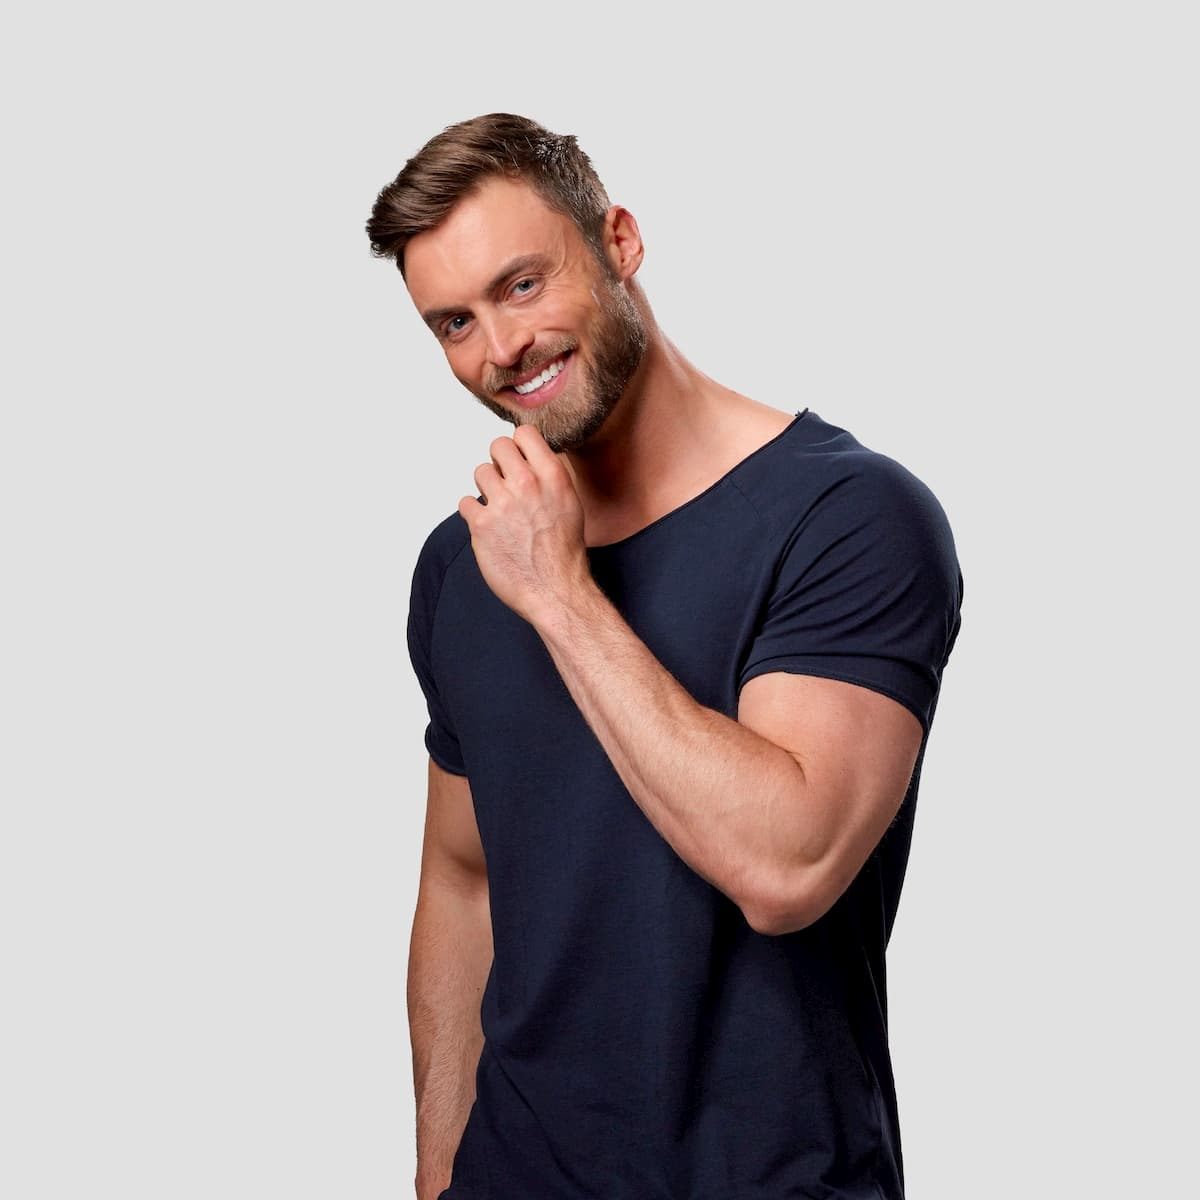 Niko Griesert - Bachelor 2021 im T-Shirt